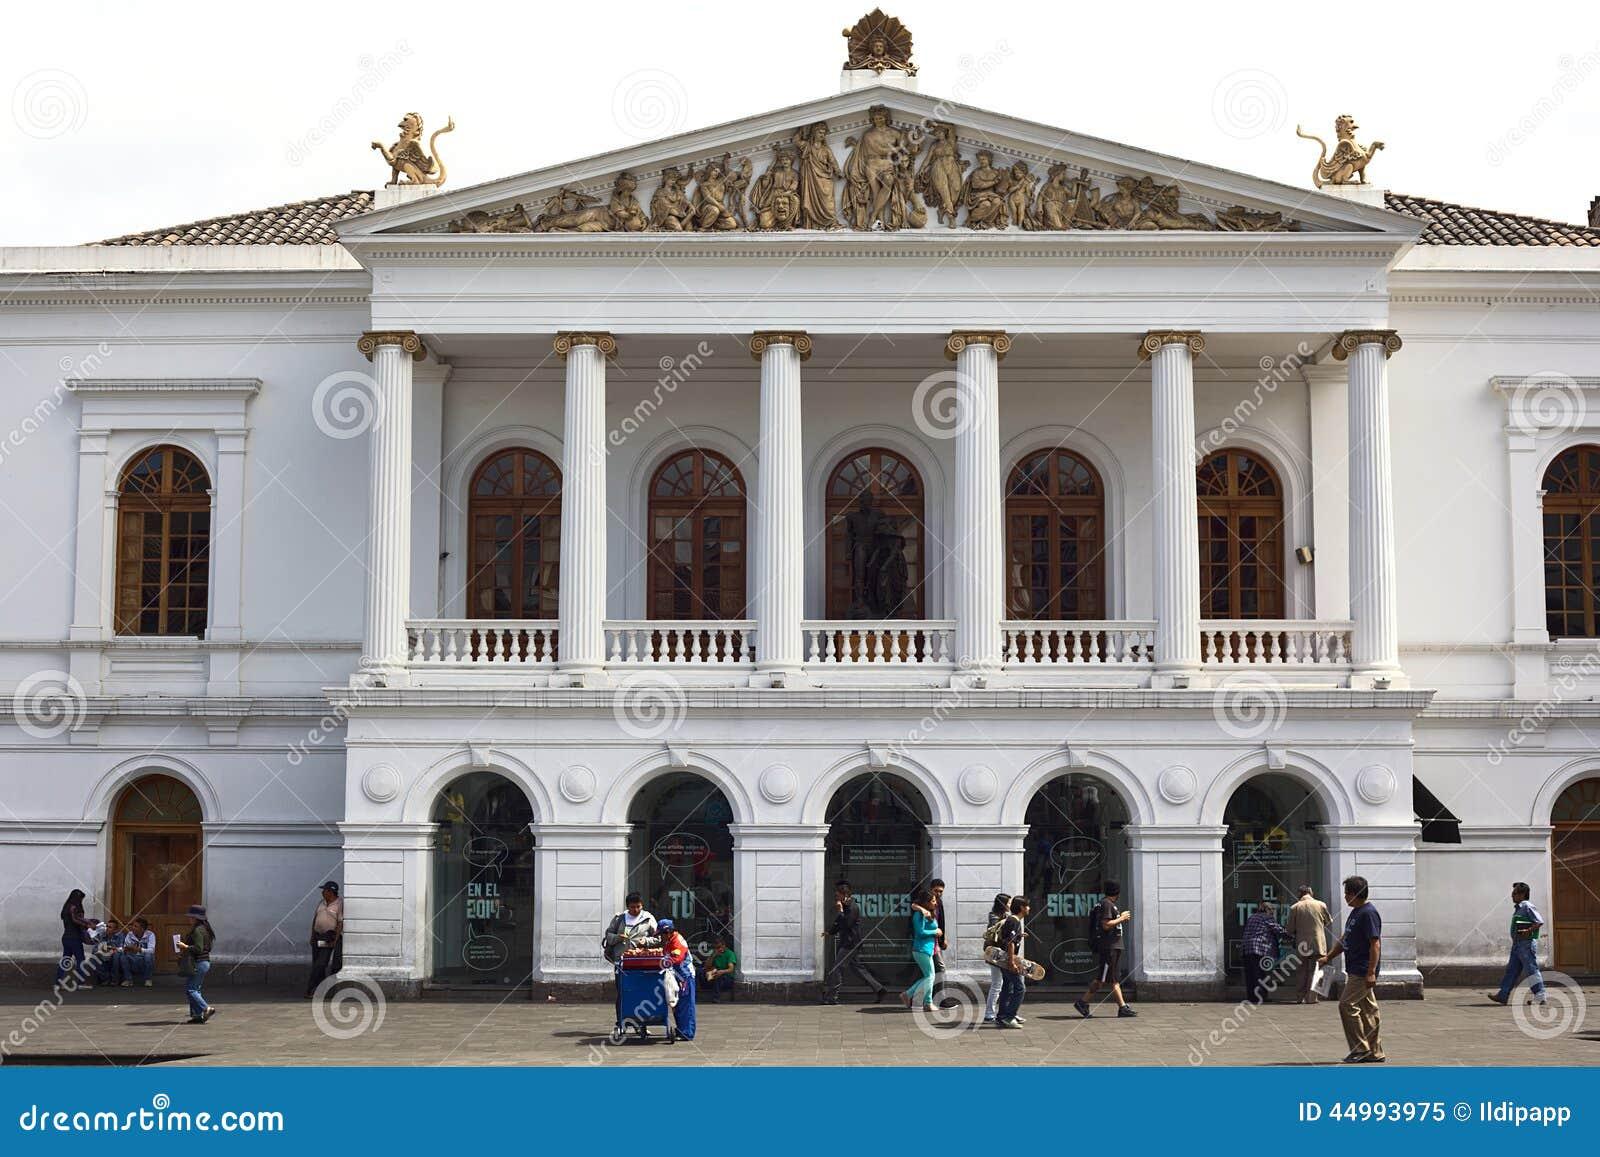 Sucre National Theater On Plaza Del Teatro In Quito